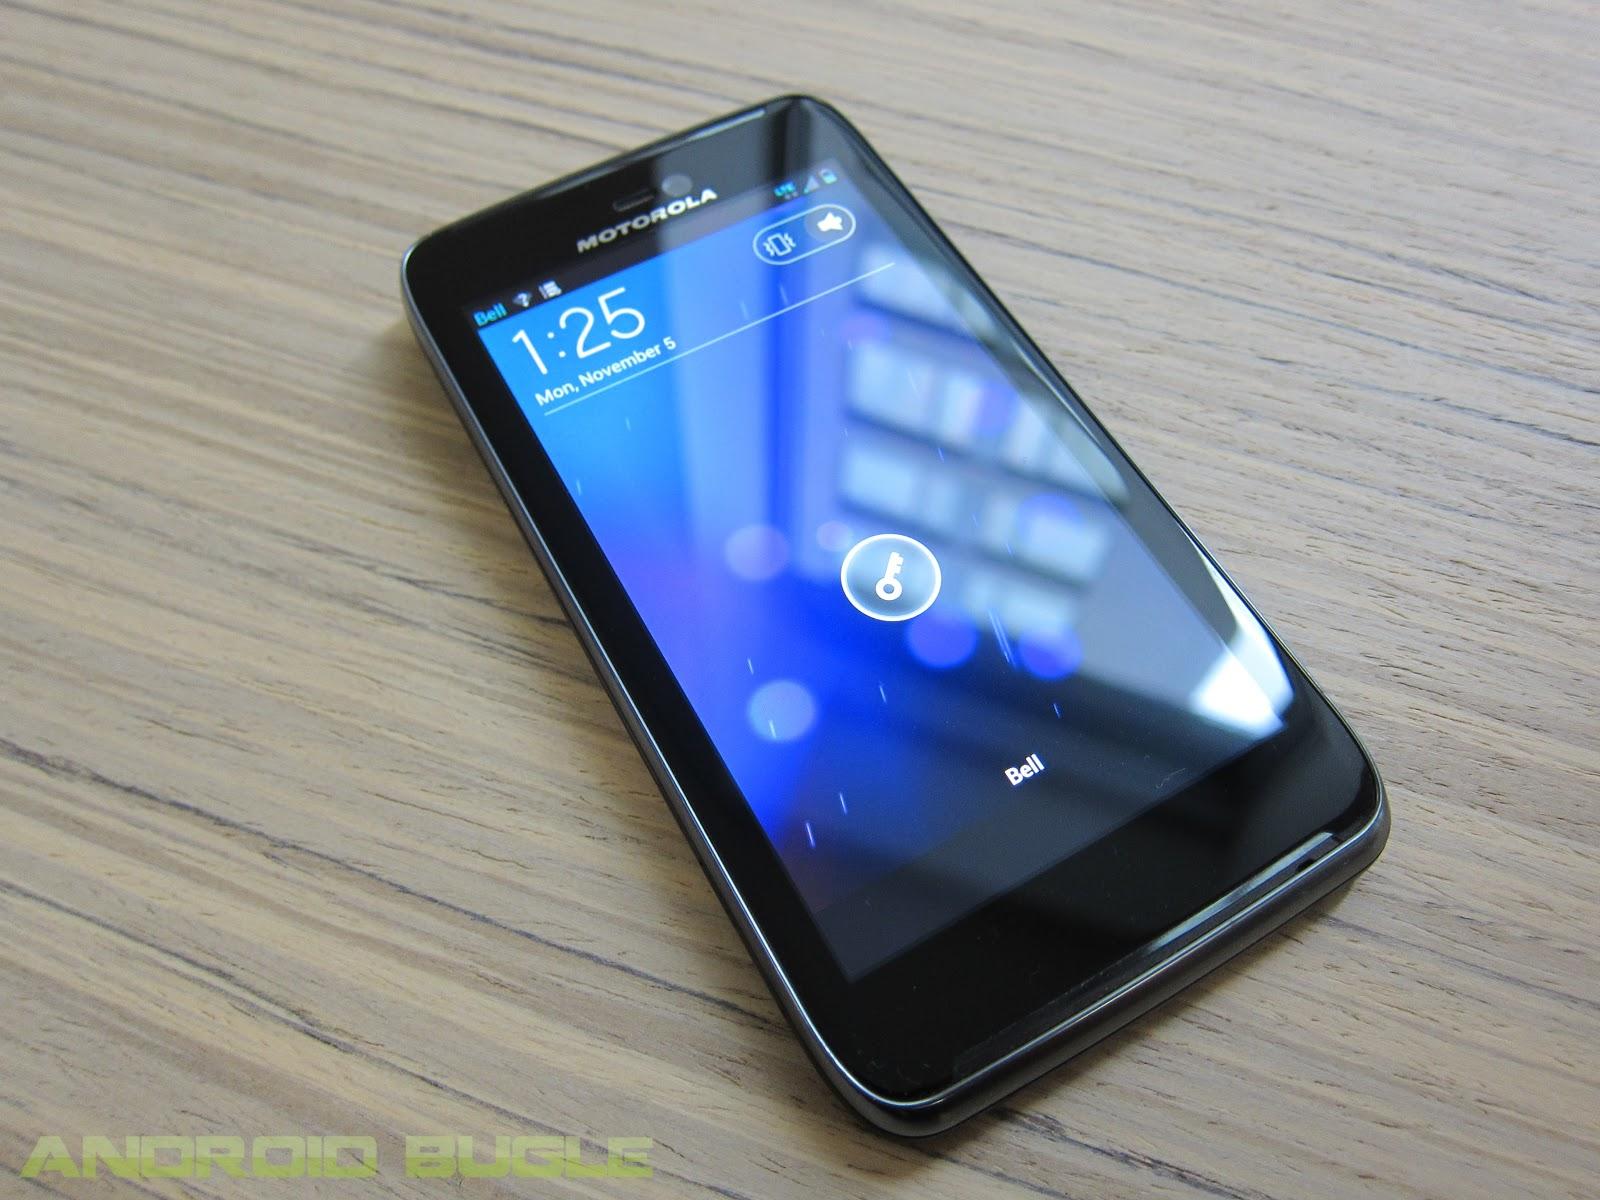 motorola atrix hd lte review android bugle Motorola Atrix HD 4G Motorola Atrix HD LTE Wallet